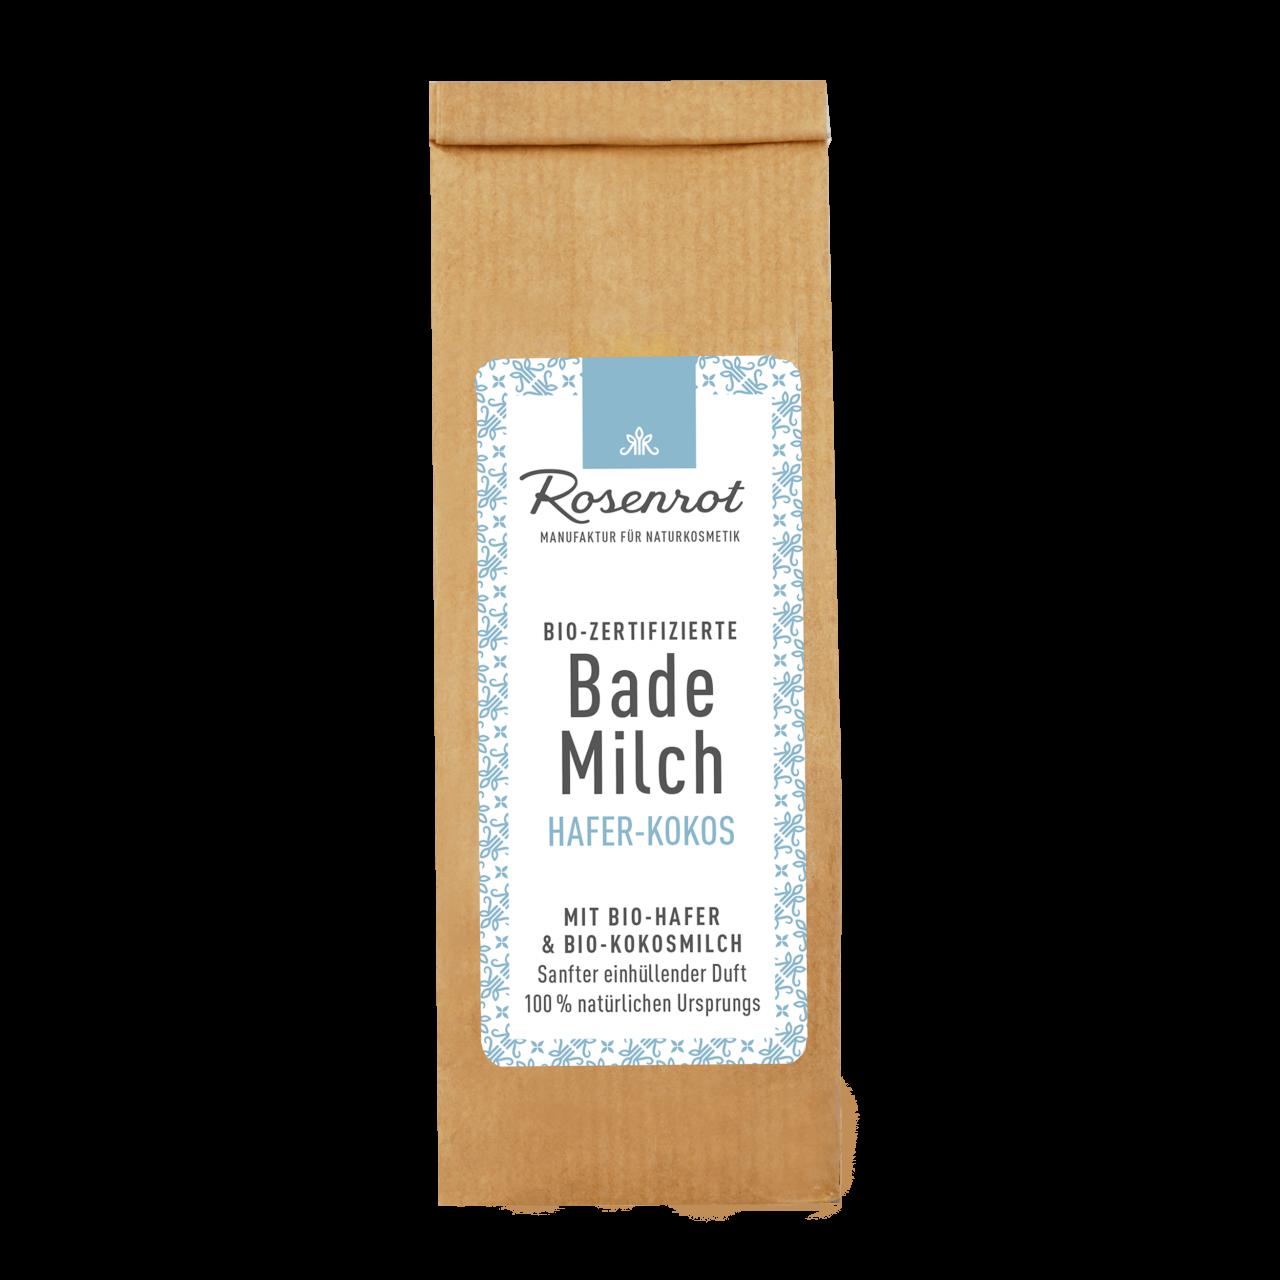 Bademilch Hafer-Kokos